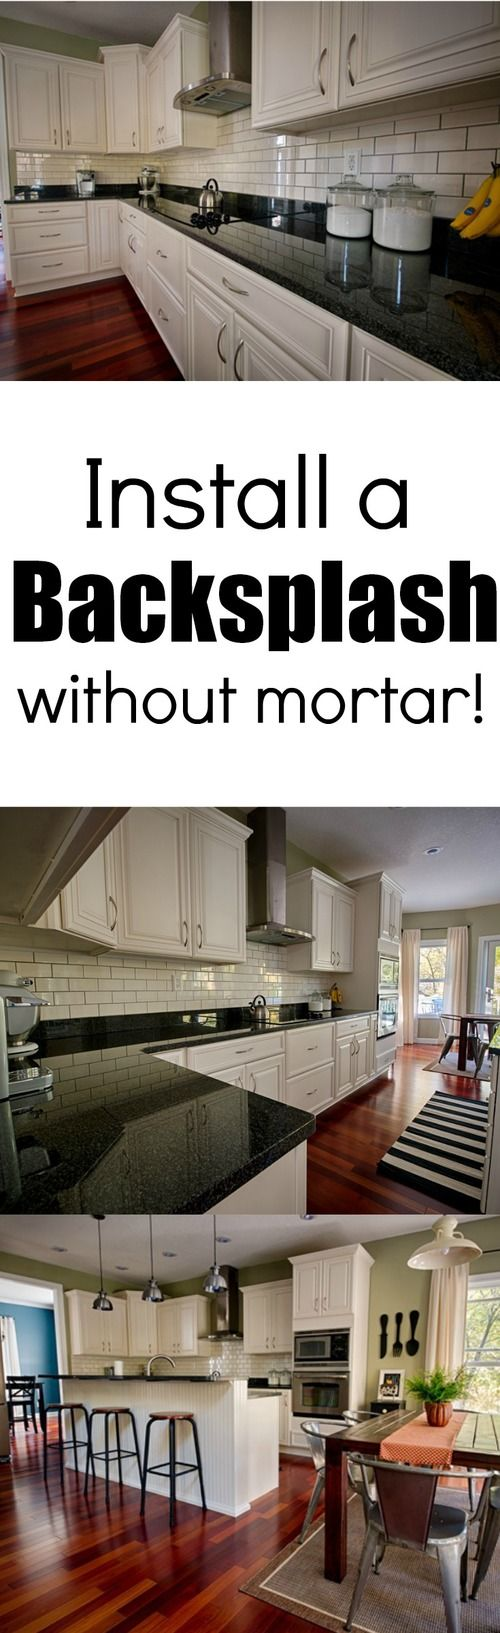 Kitchen Backsplash: Subway Tile Edition